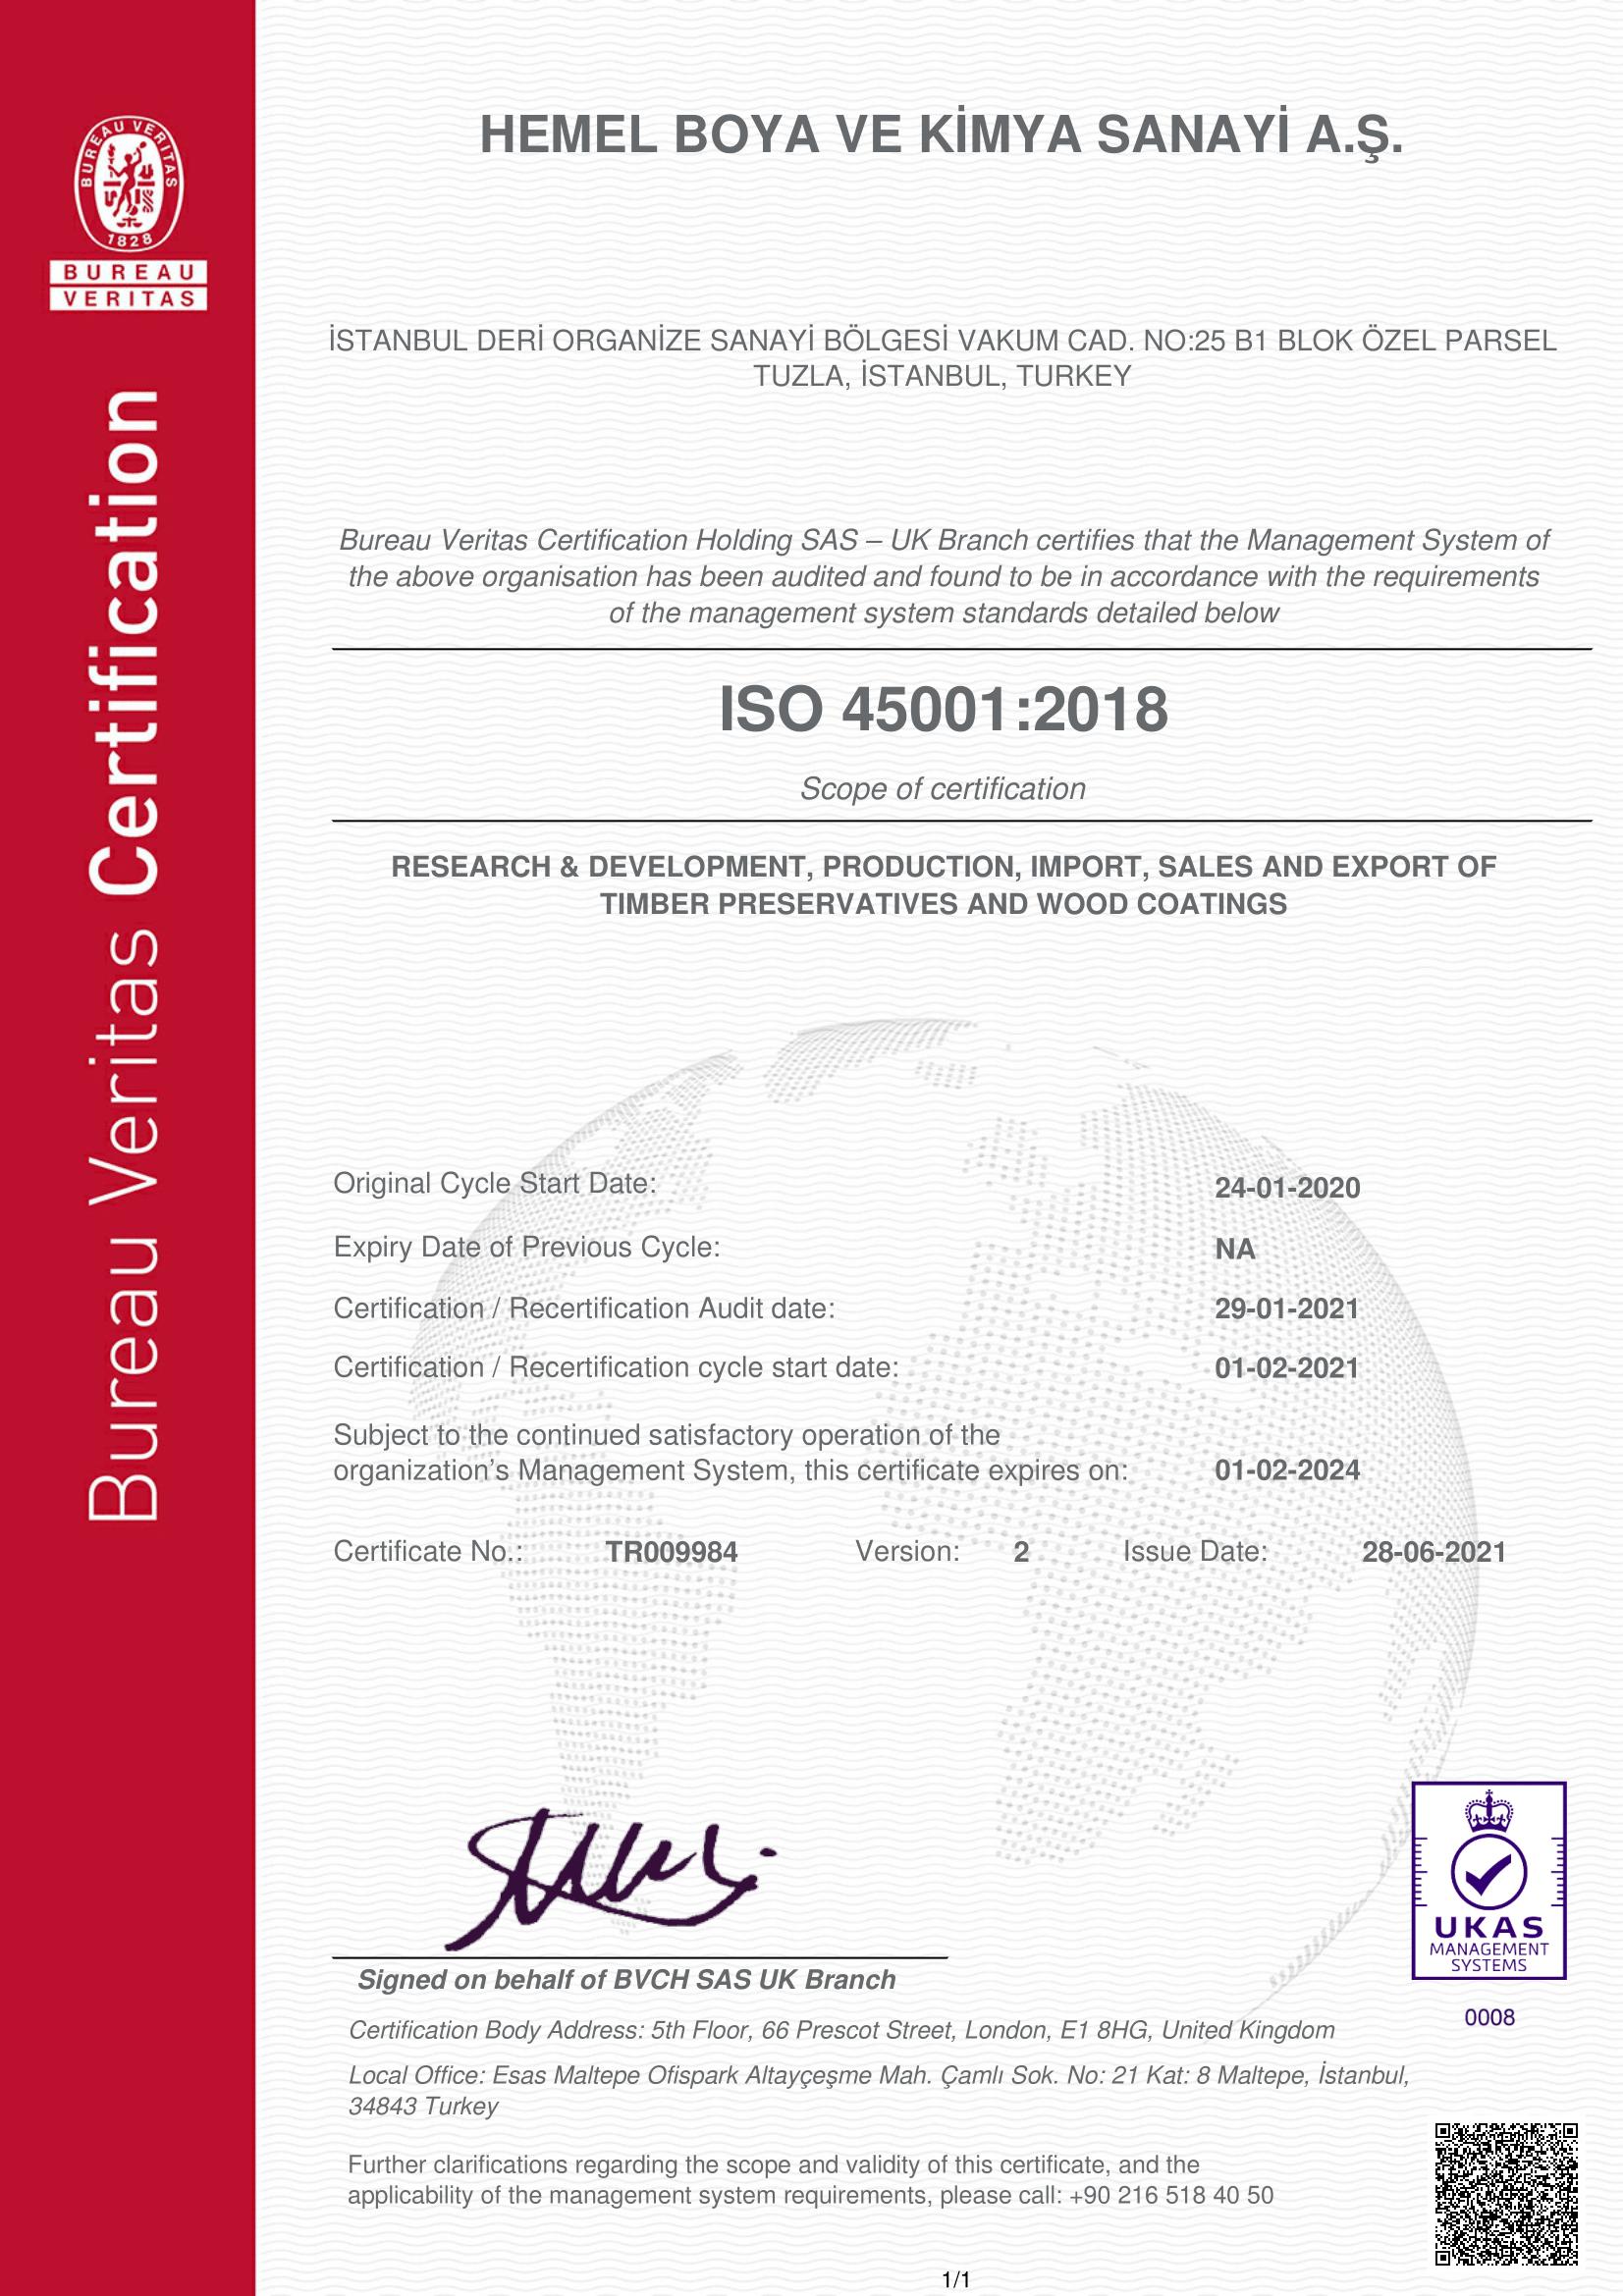 ISO45001-2018-Hemel-2021.png (514 KB)